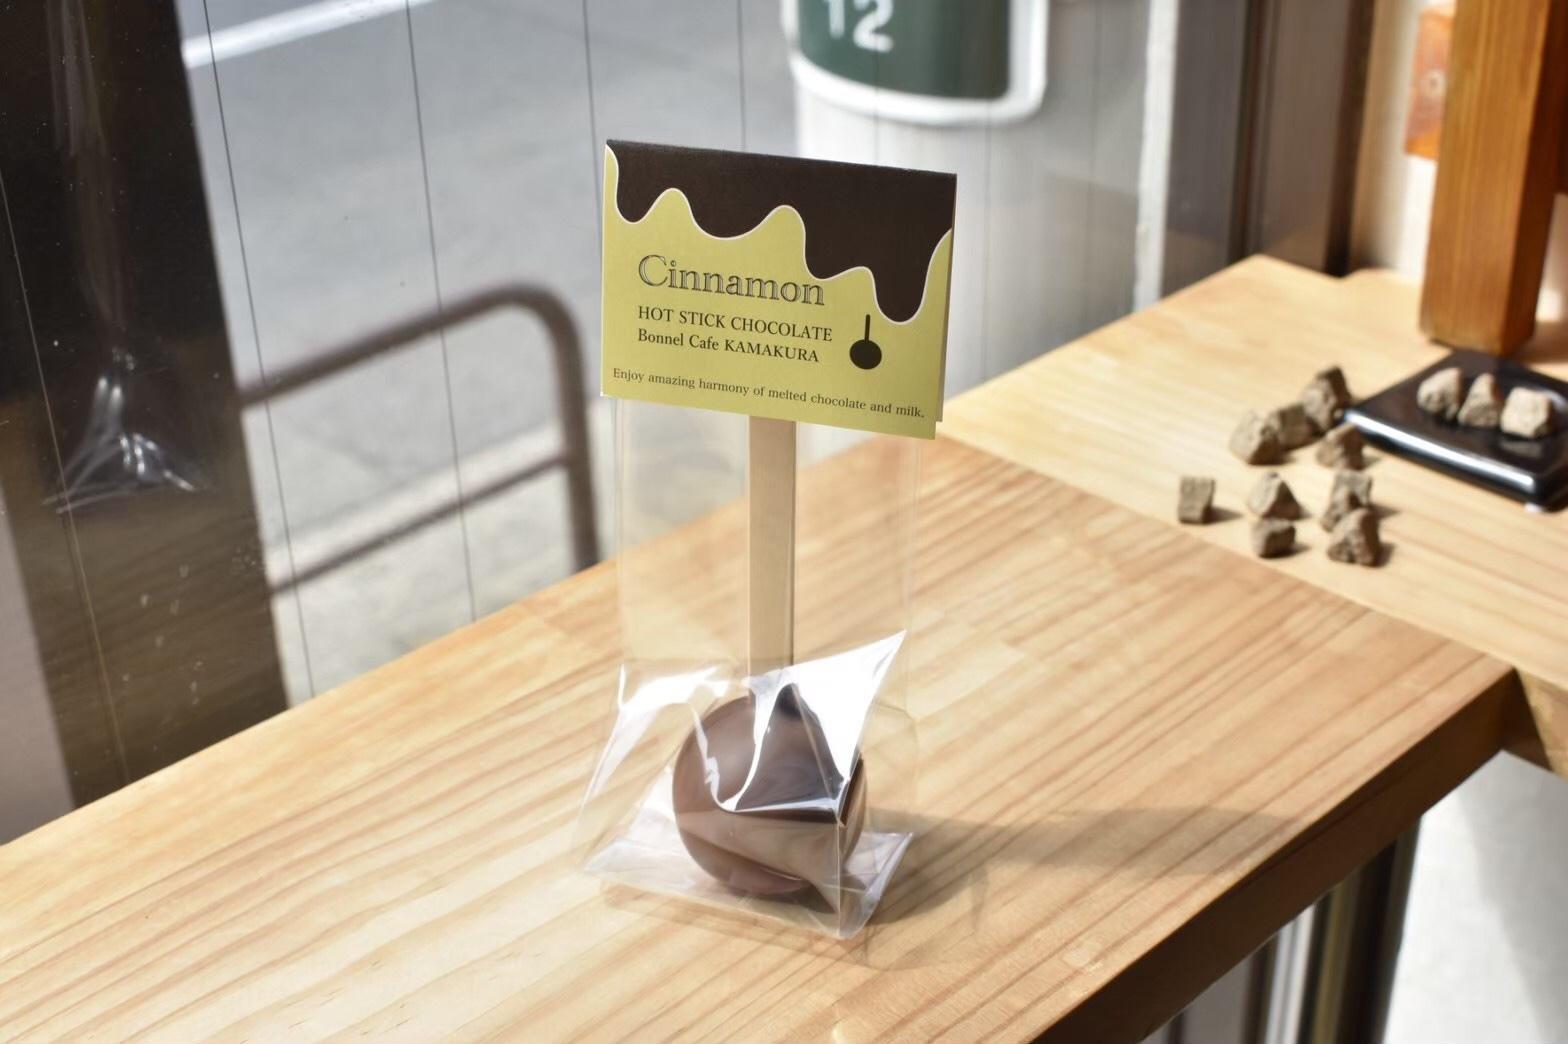 Hot Stick Chocolate 【シナモン】